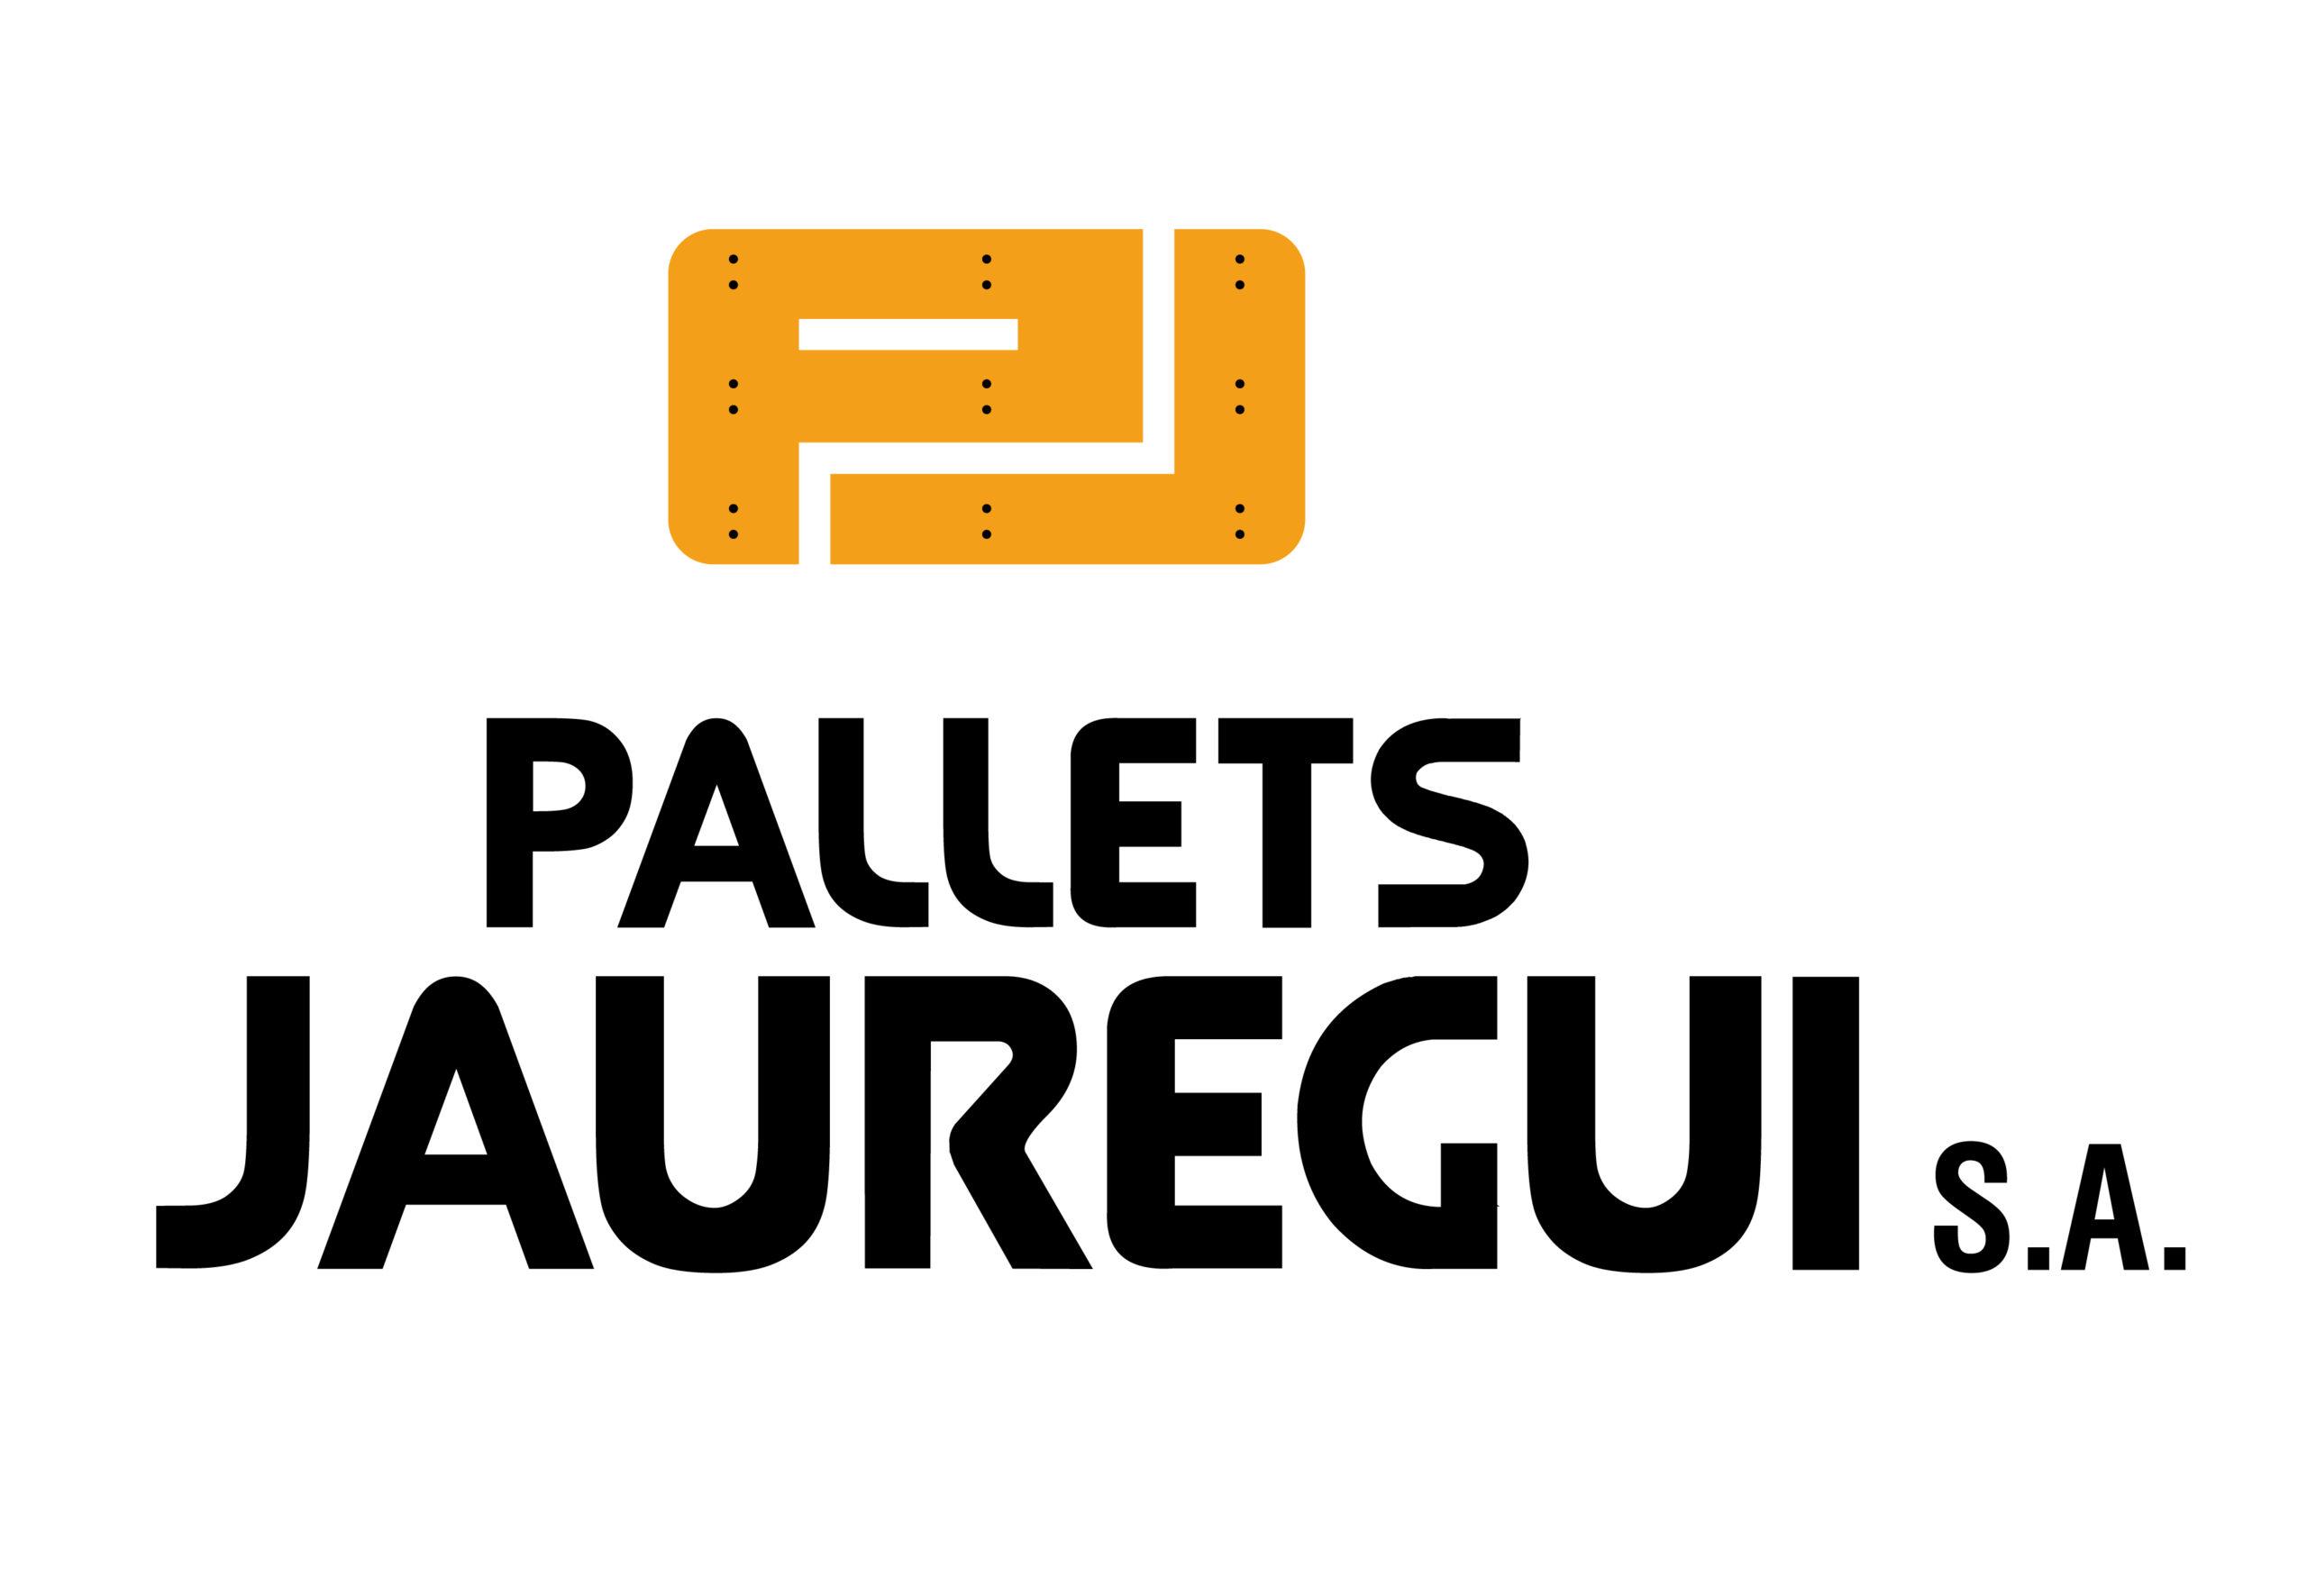 Pallets Jauregui S.A.